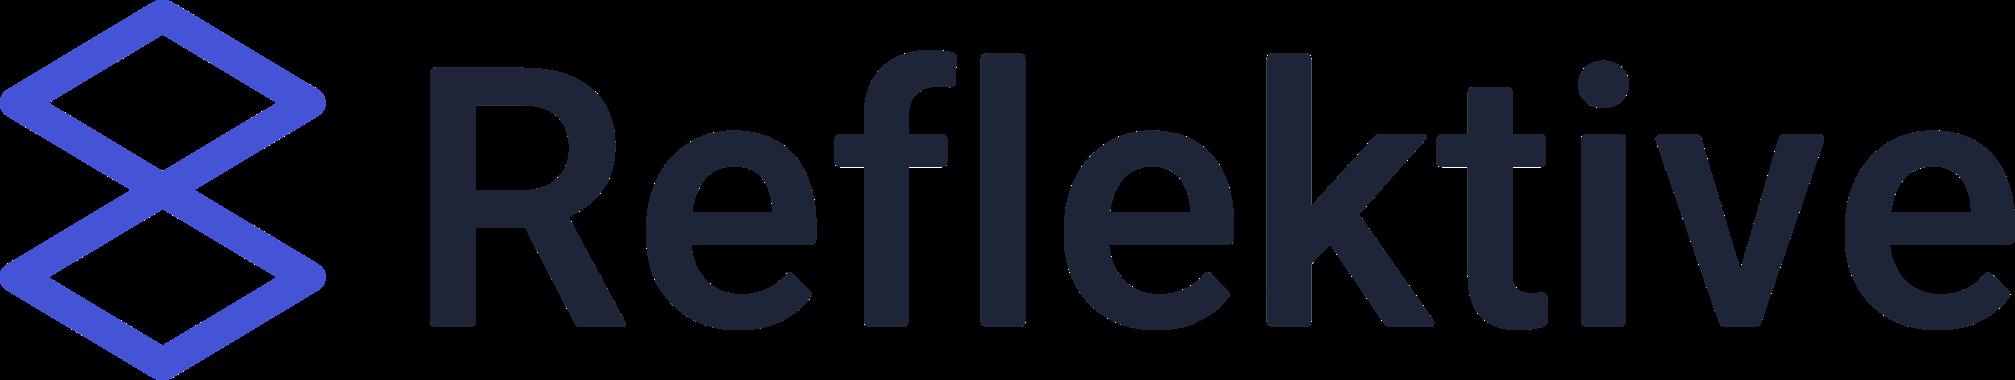 Reflektive logo